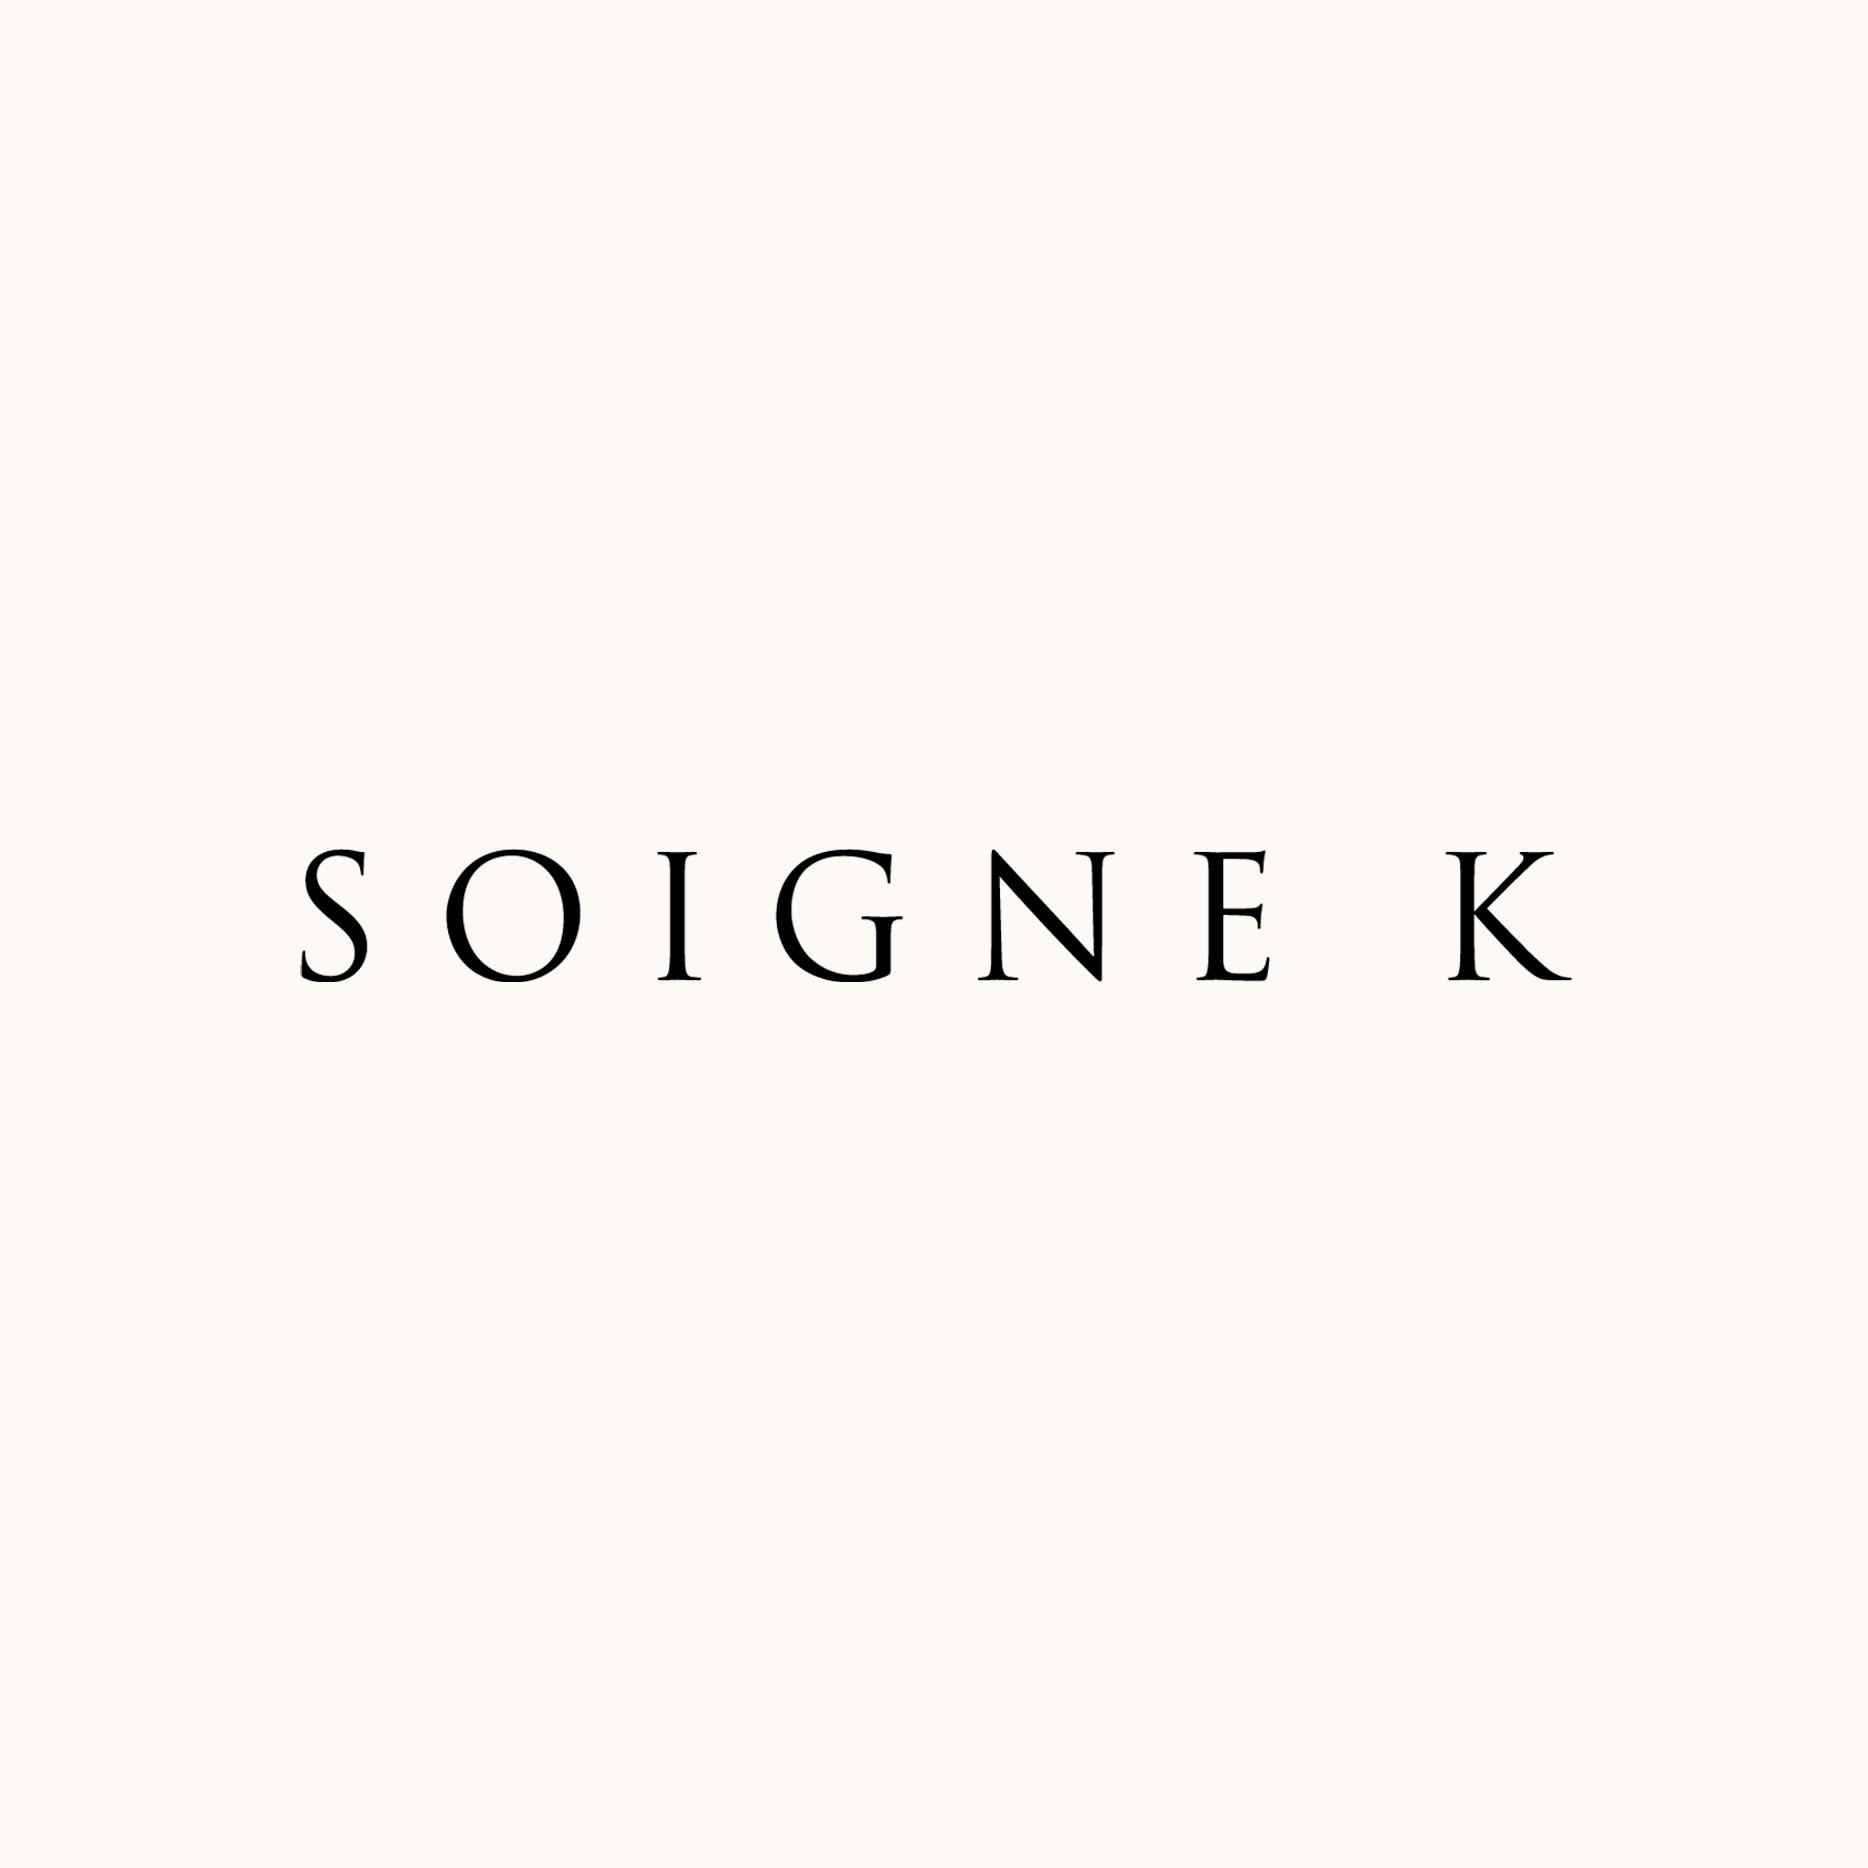 soignek_ident_th_try2